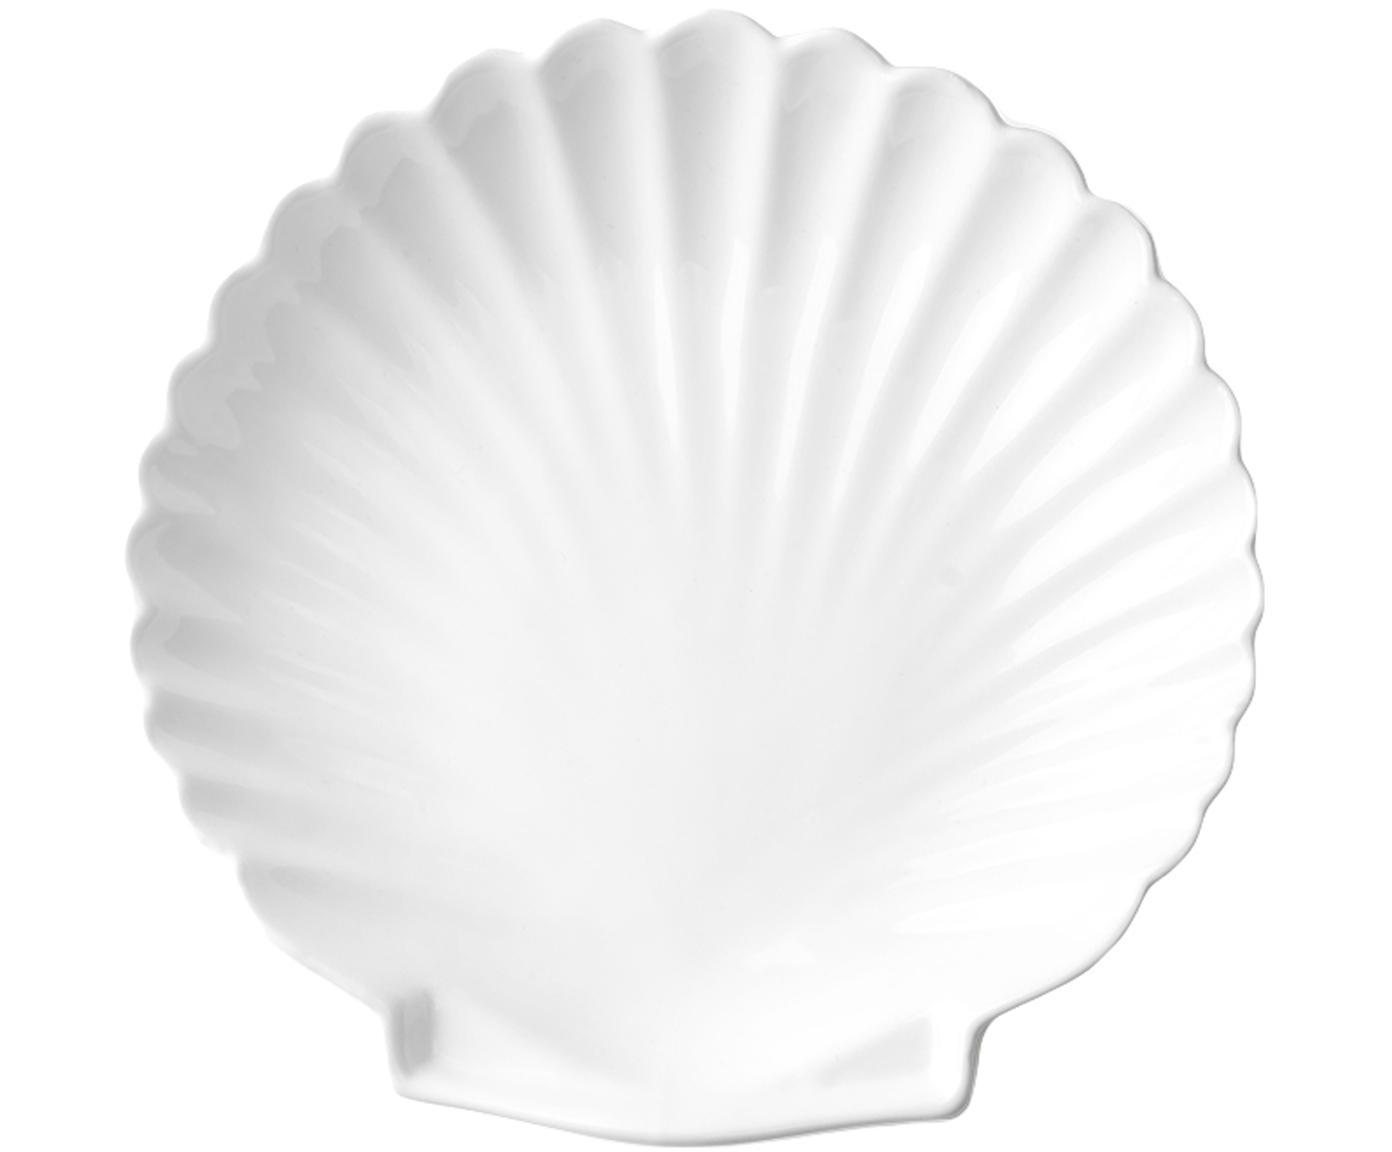 Speiseteller Shell, 2 Stück, Keramik, Weiß, Ø 20 cm